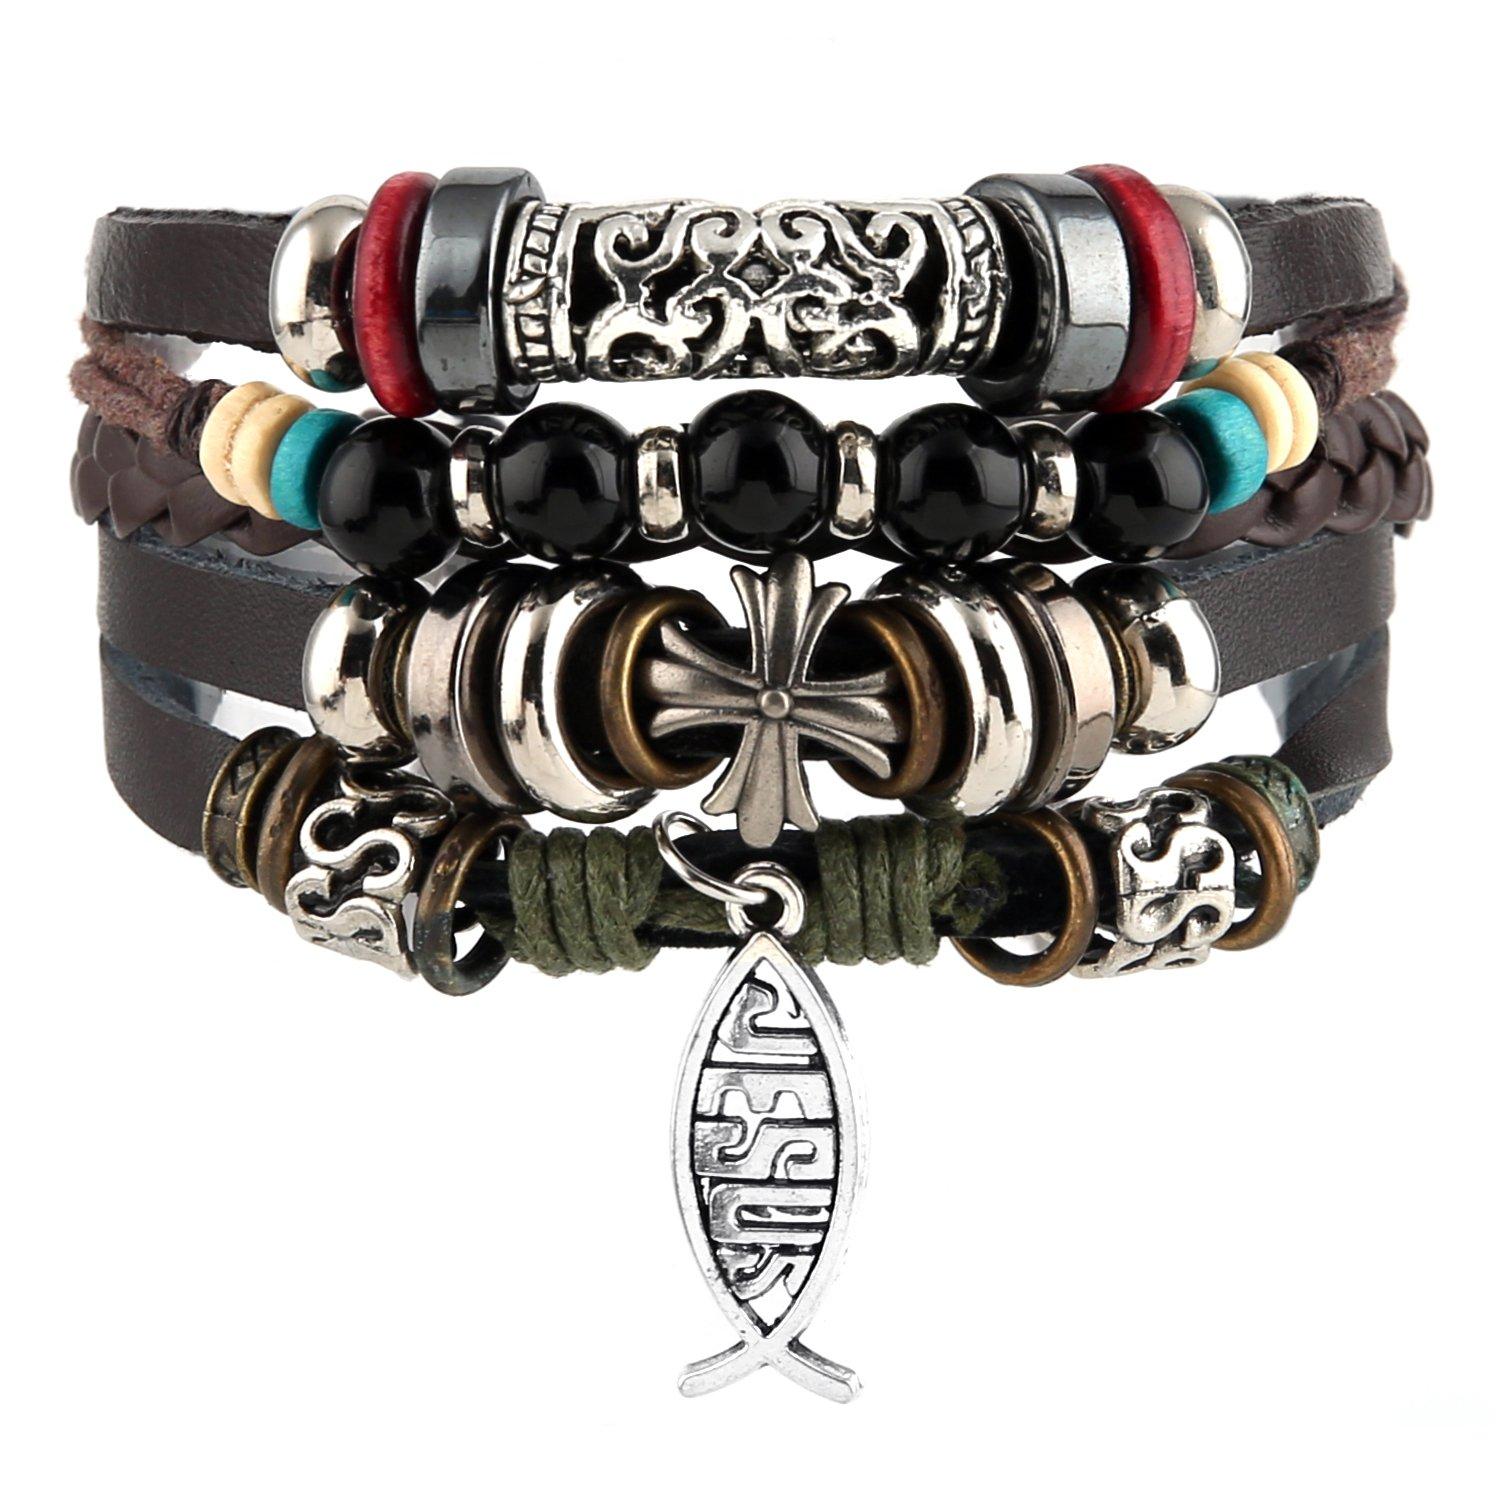 HZMAN Mix 4 Wrap Bracelets Men Women, Hemp Cords Wood Beads Ethnic Tribal Bracelets, Leather Wristbands SZ7506F